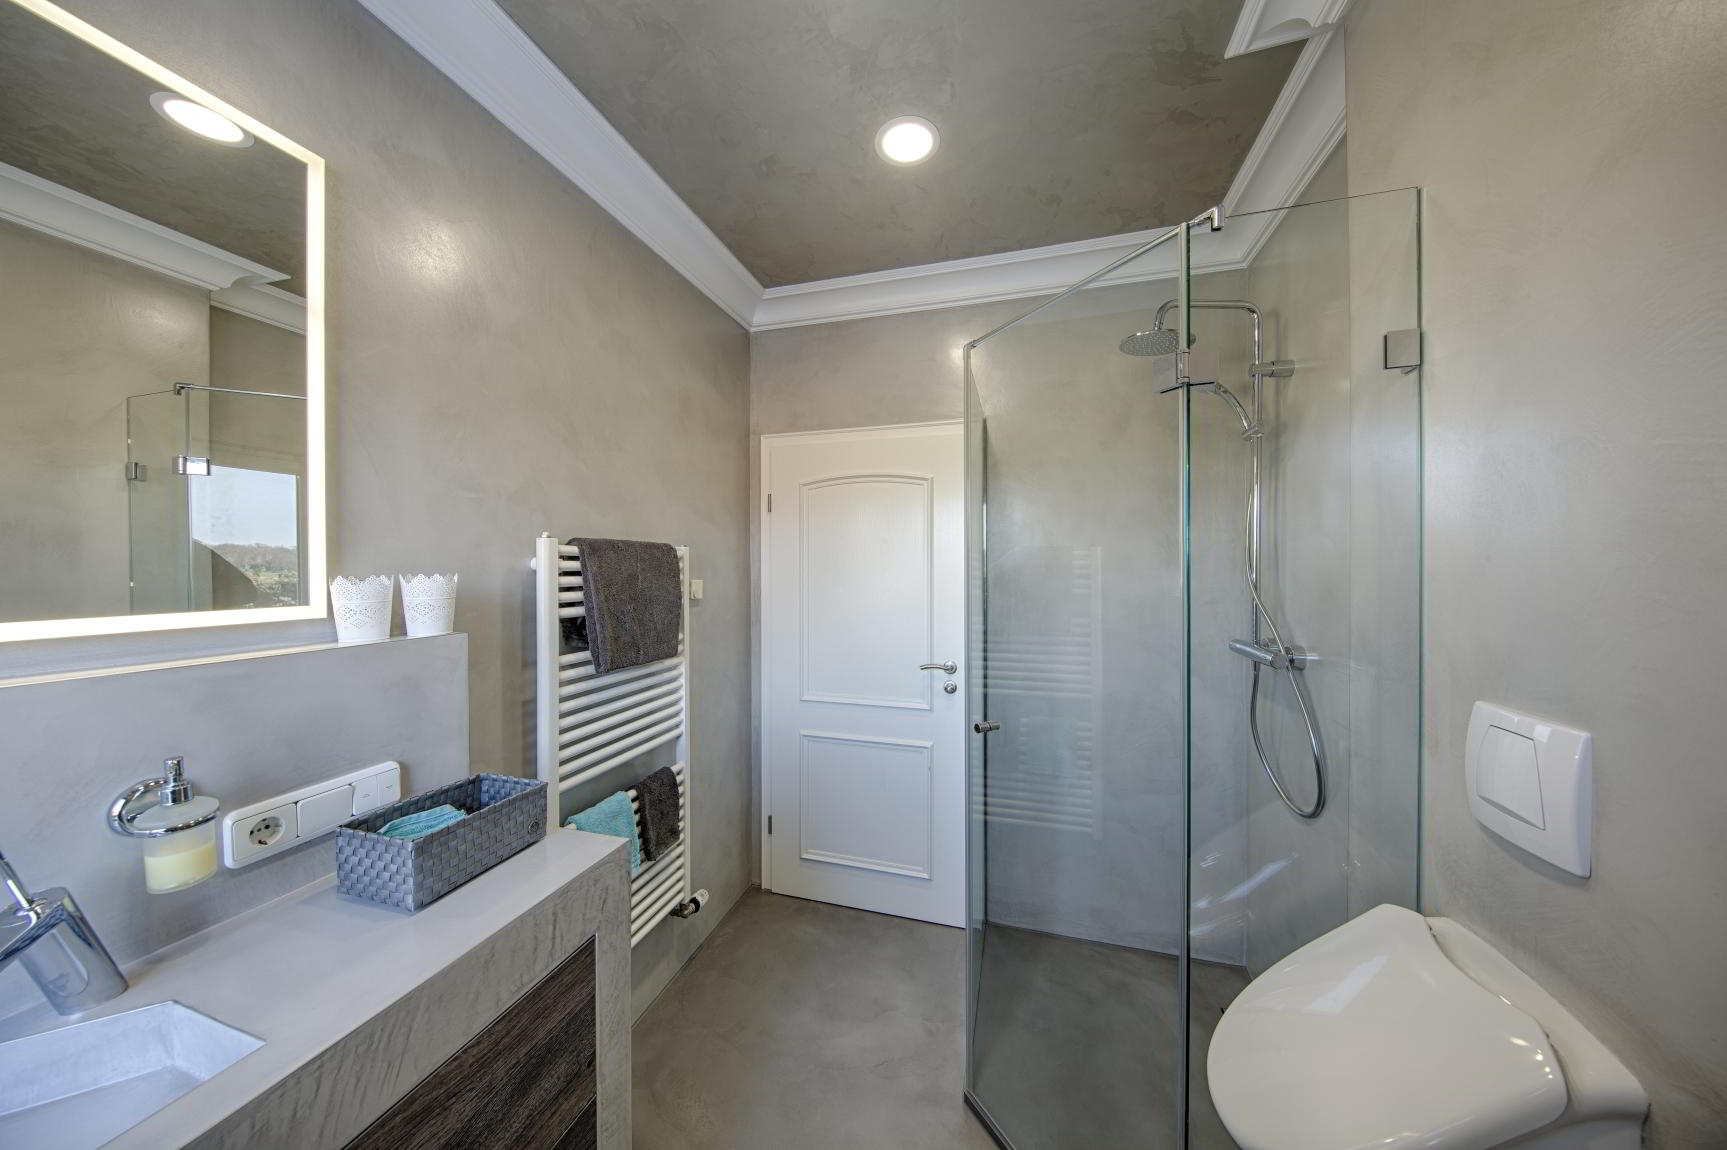 Beton stuc GS Afbouw Emmeloord badkamer